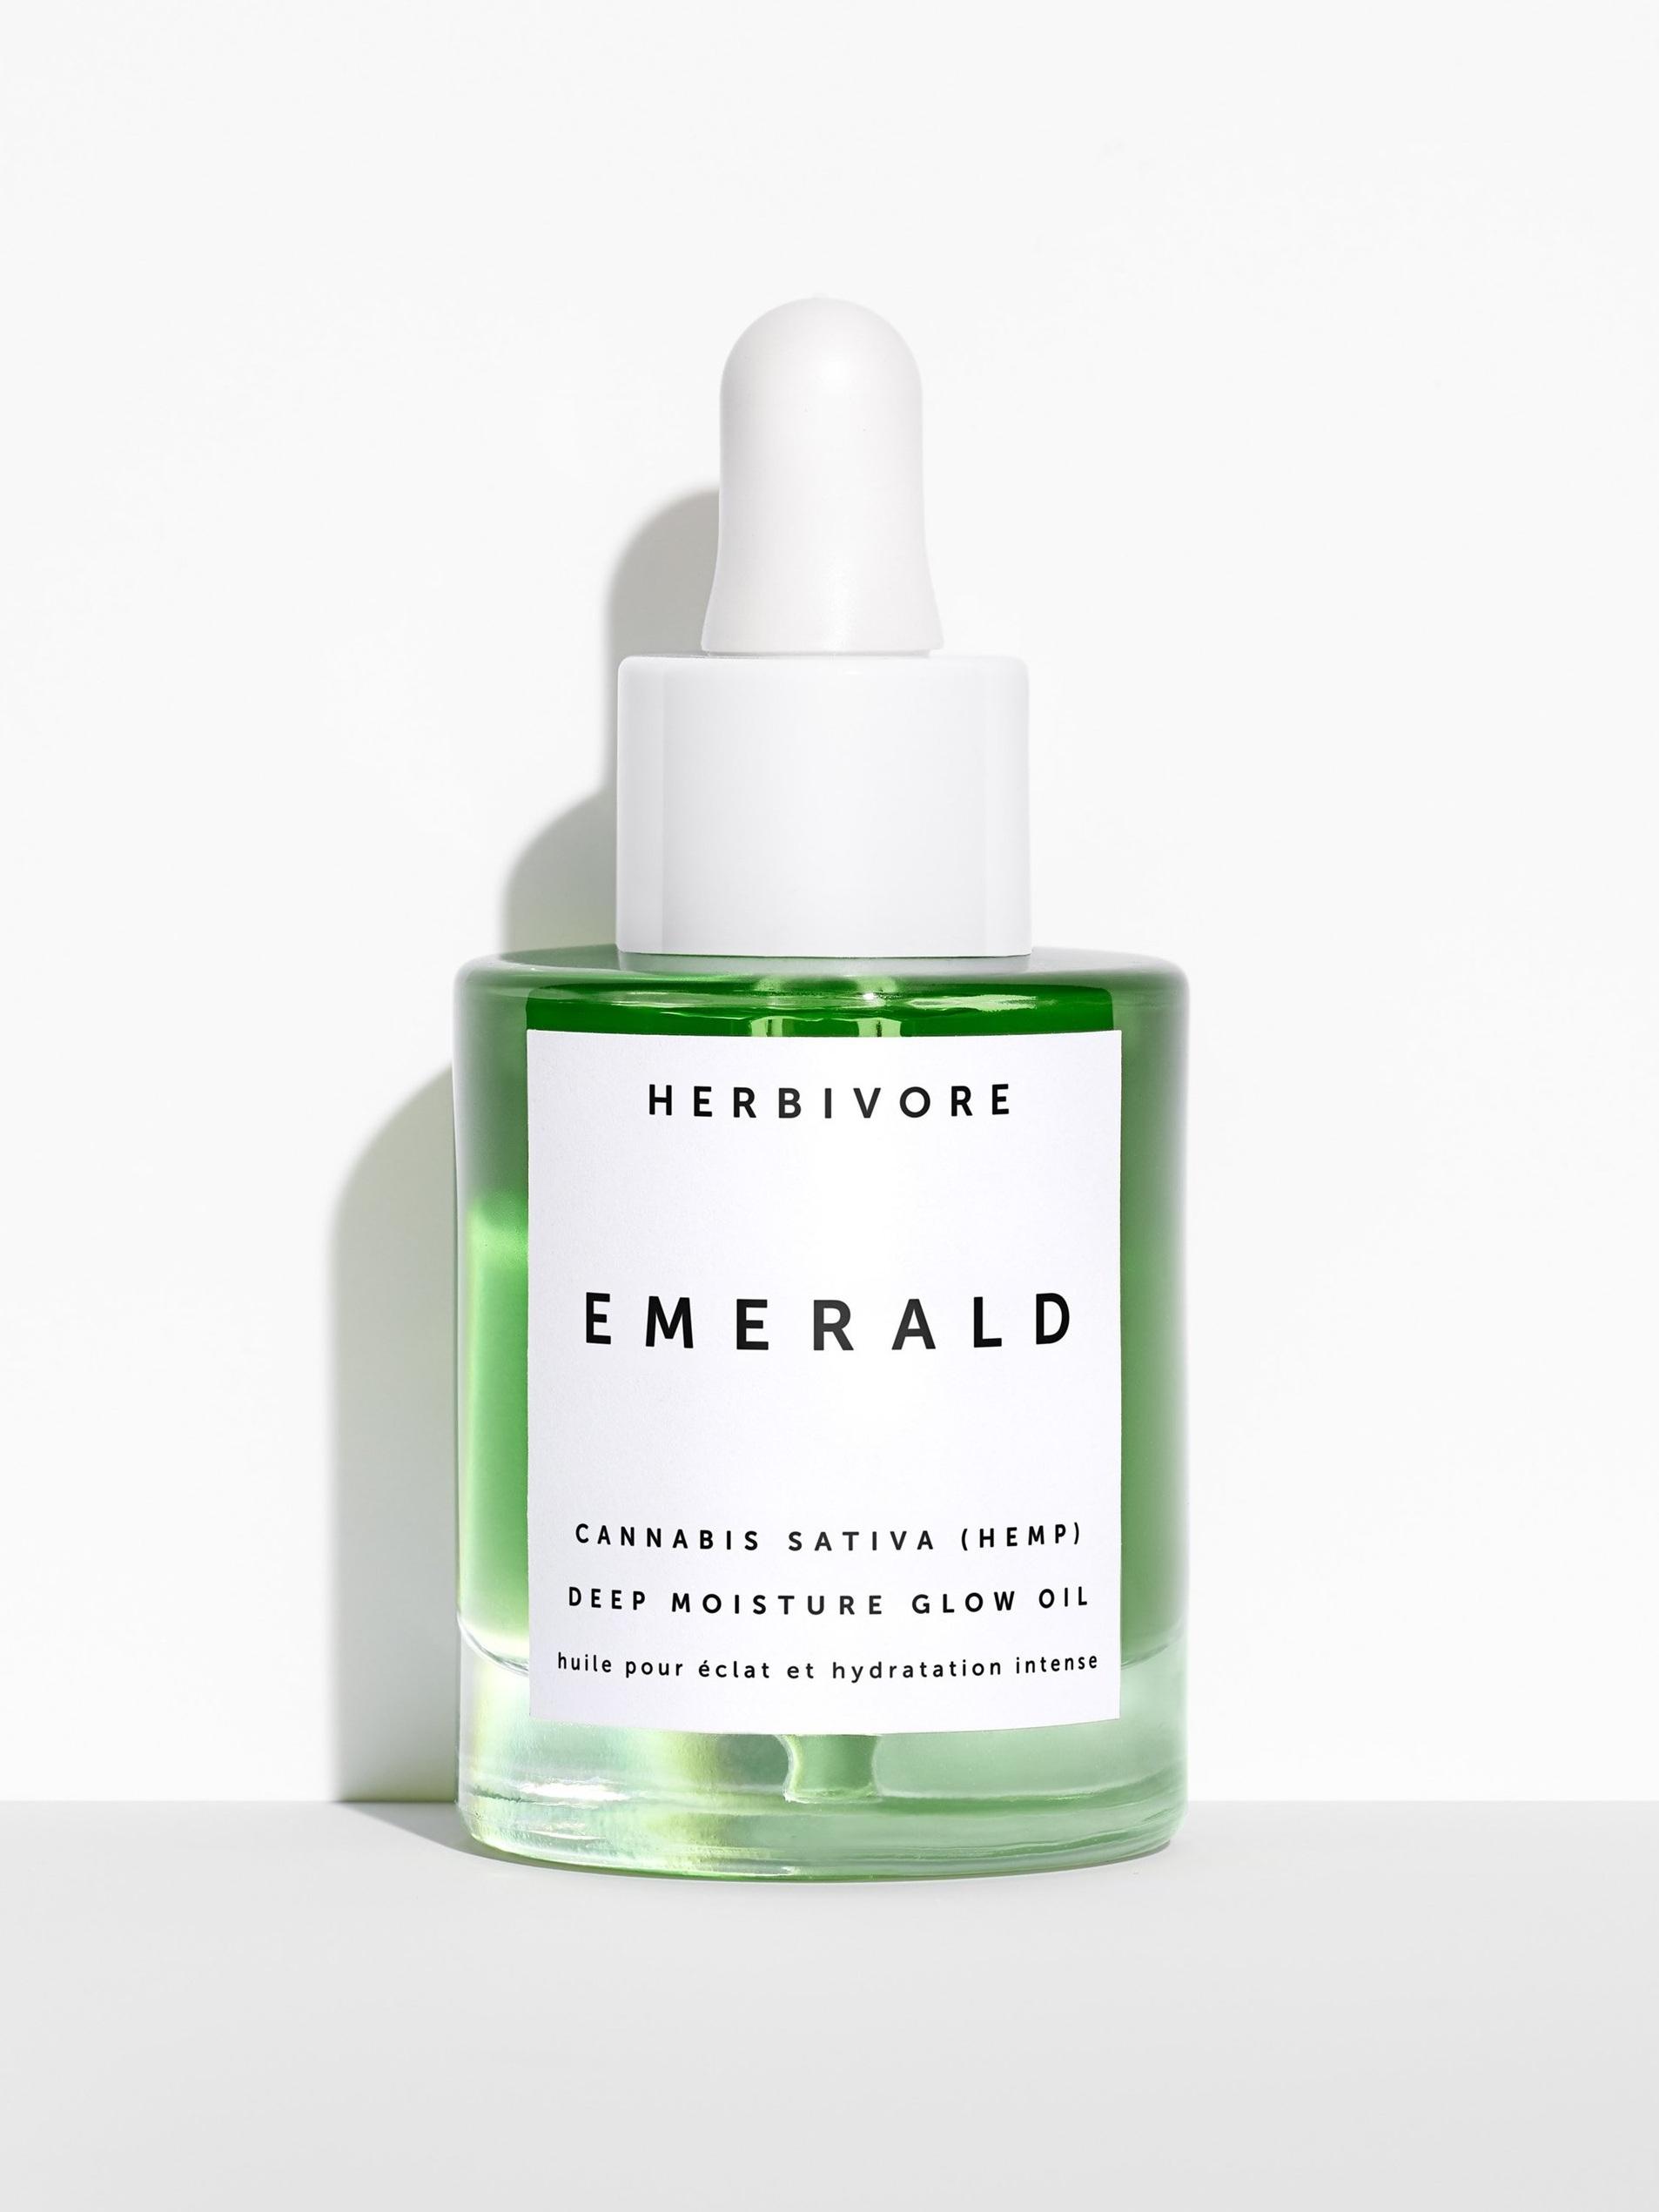 Hemp Based Beauty Products - Herbivore Hemp Seed Deep Moisture Glow Oil